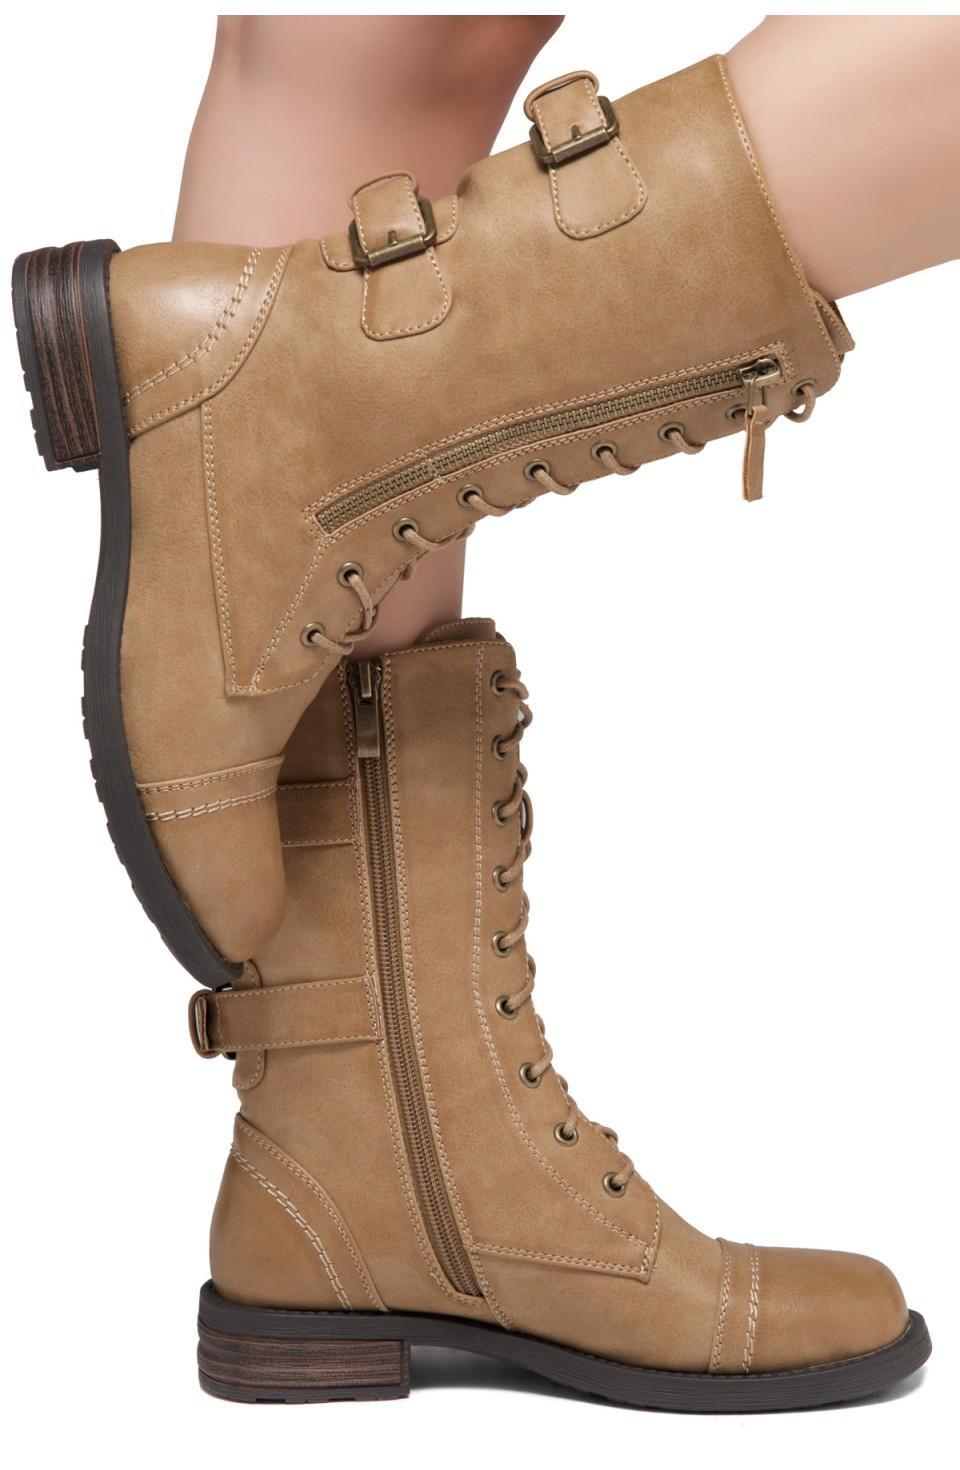 ShoeLand KASEY-Women's Military Lace Up Front, Zipper, Double Buckled, Combat Boots (Khaki)